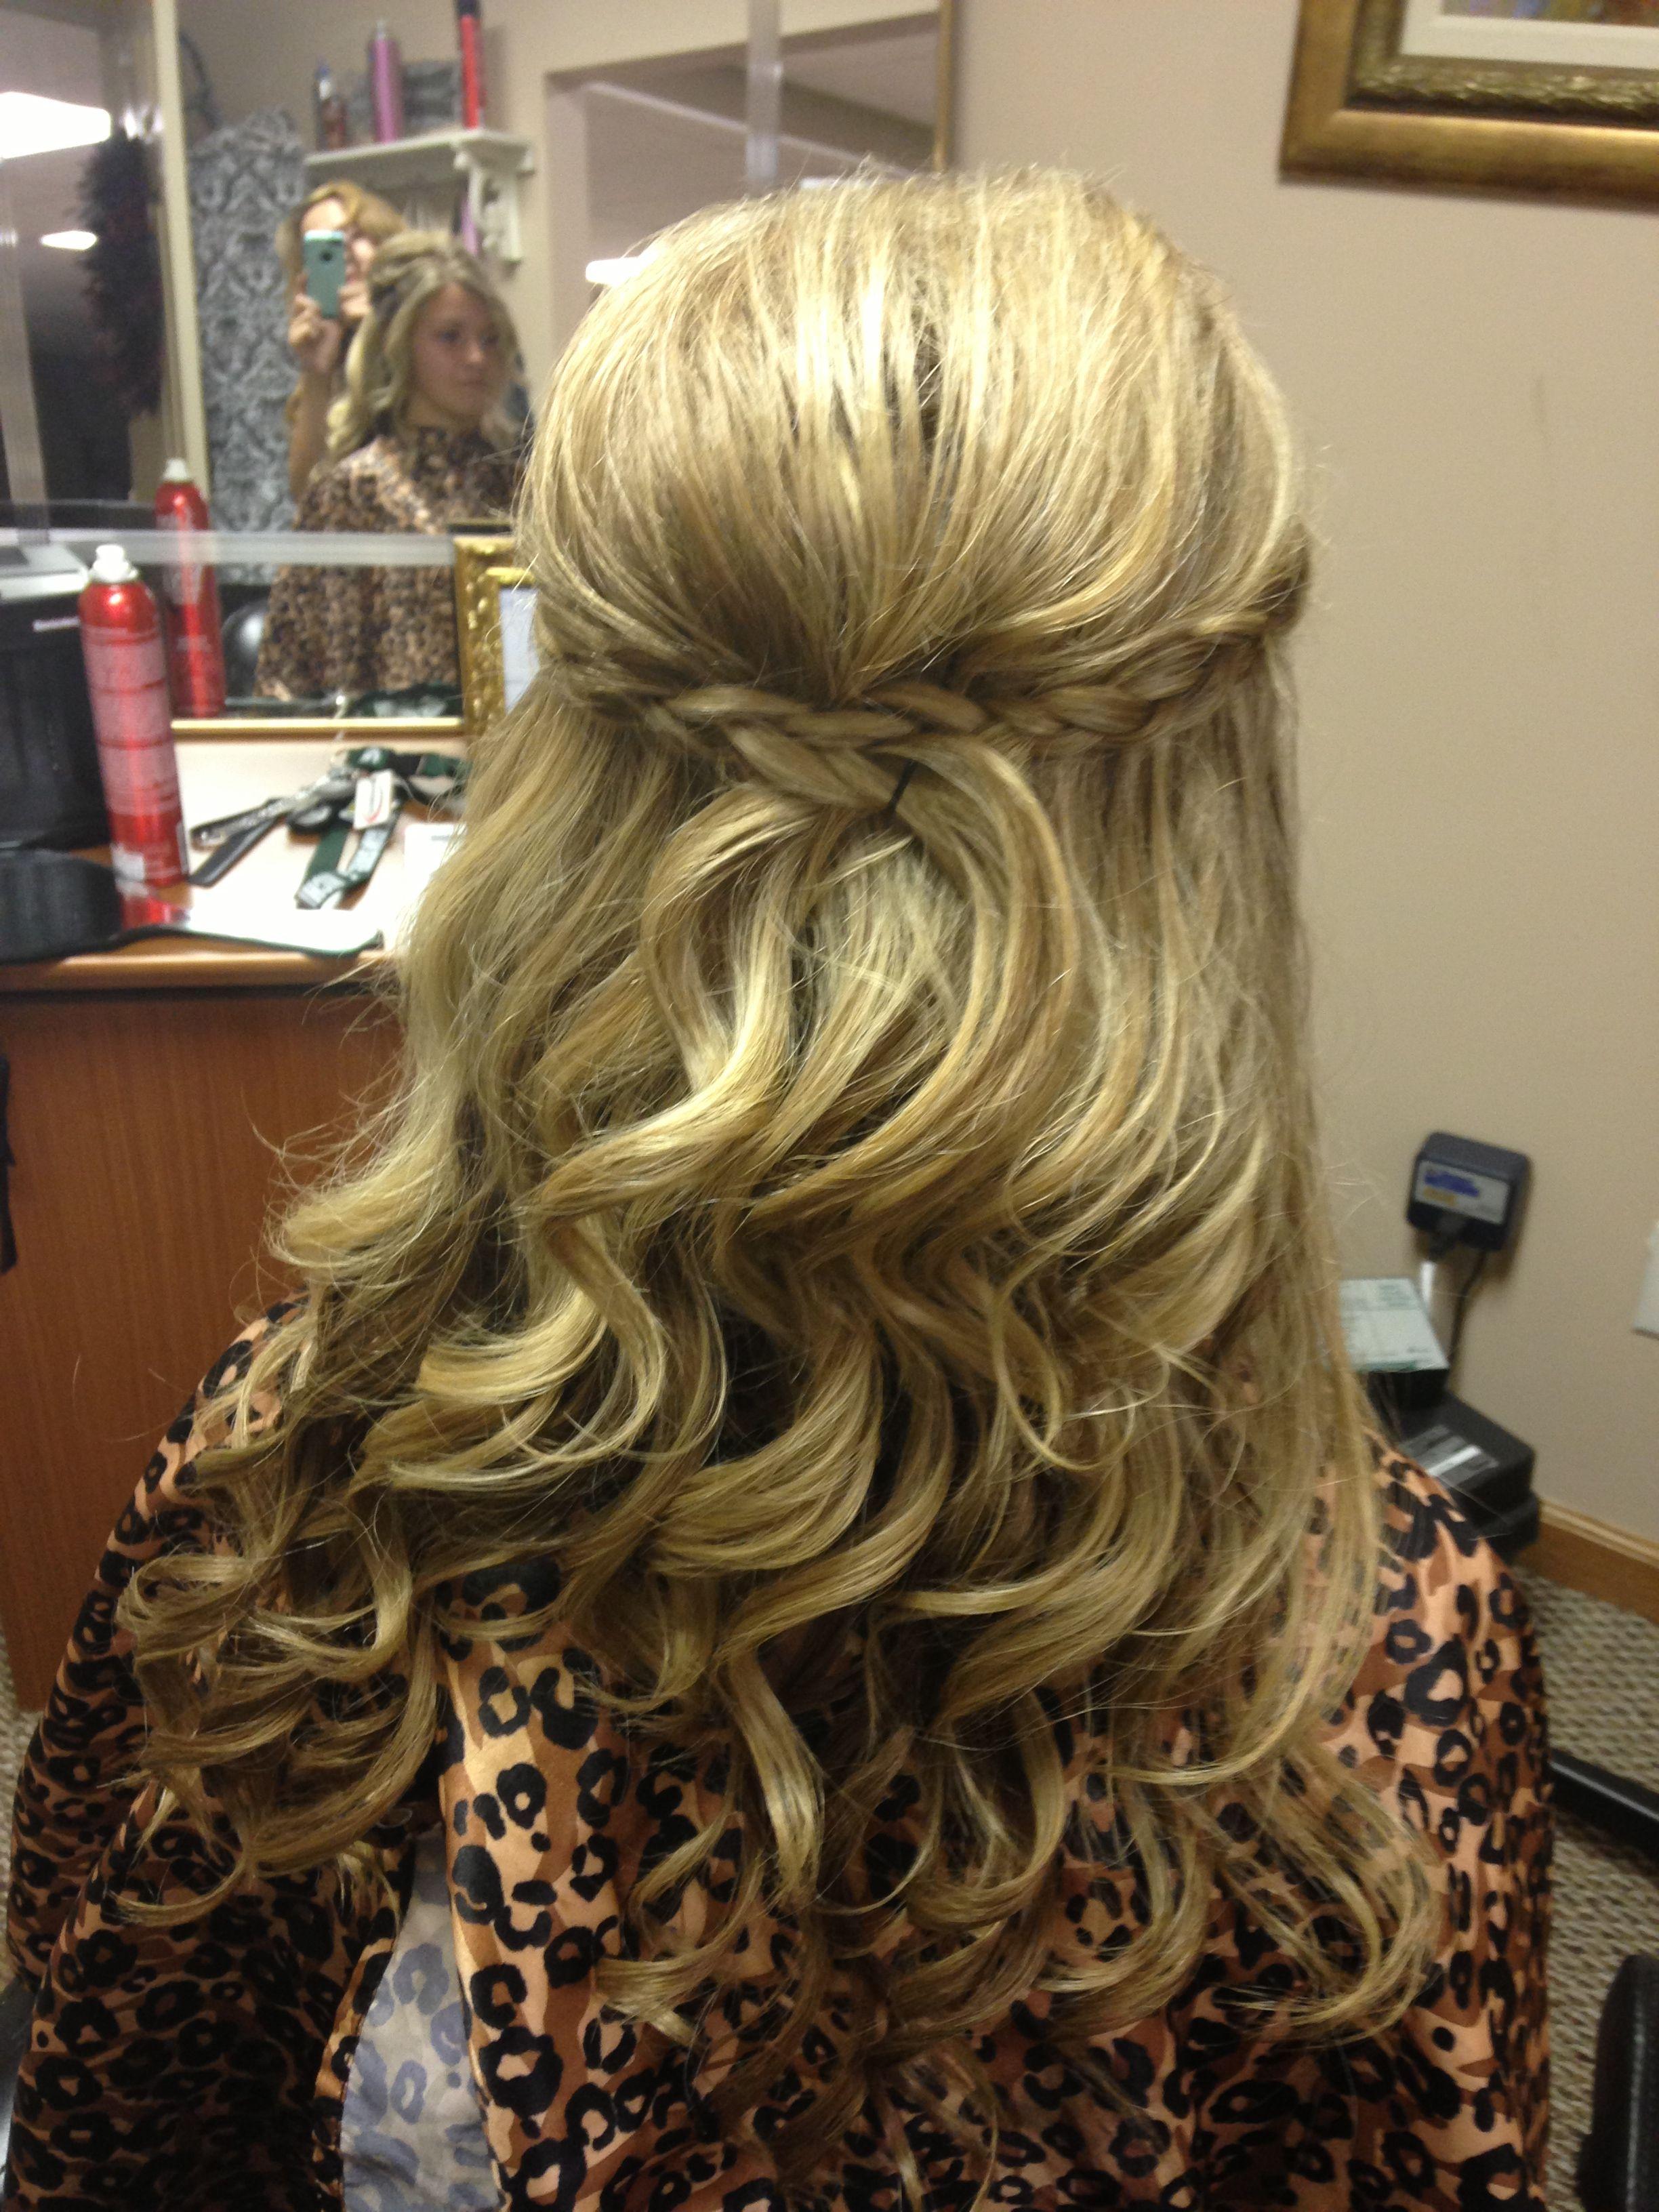 Prom Hair 2013 Hair Styles Prom Hair Hair Makeup